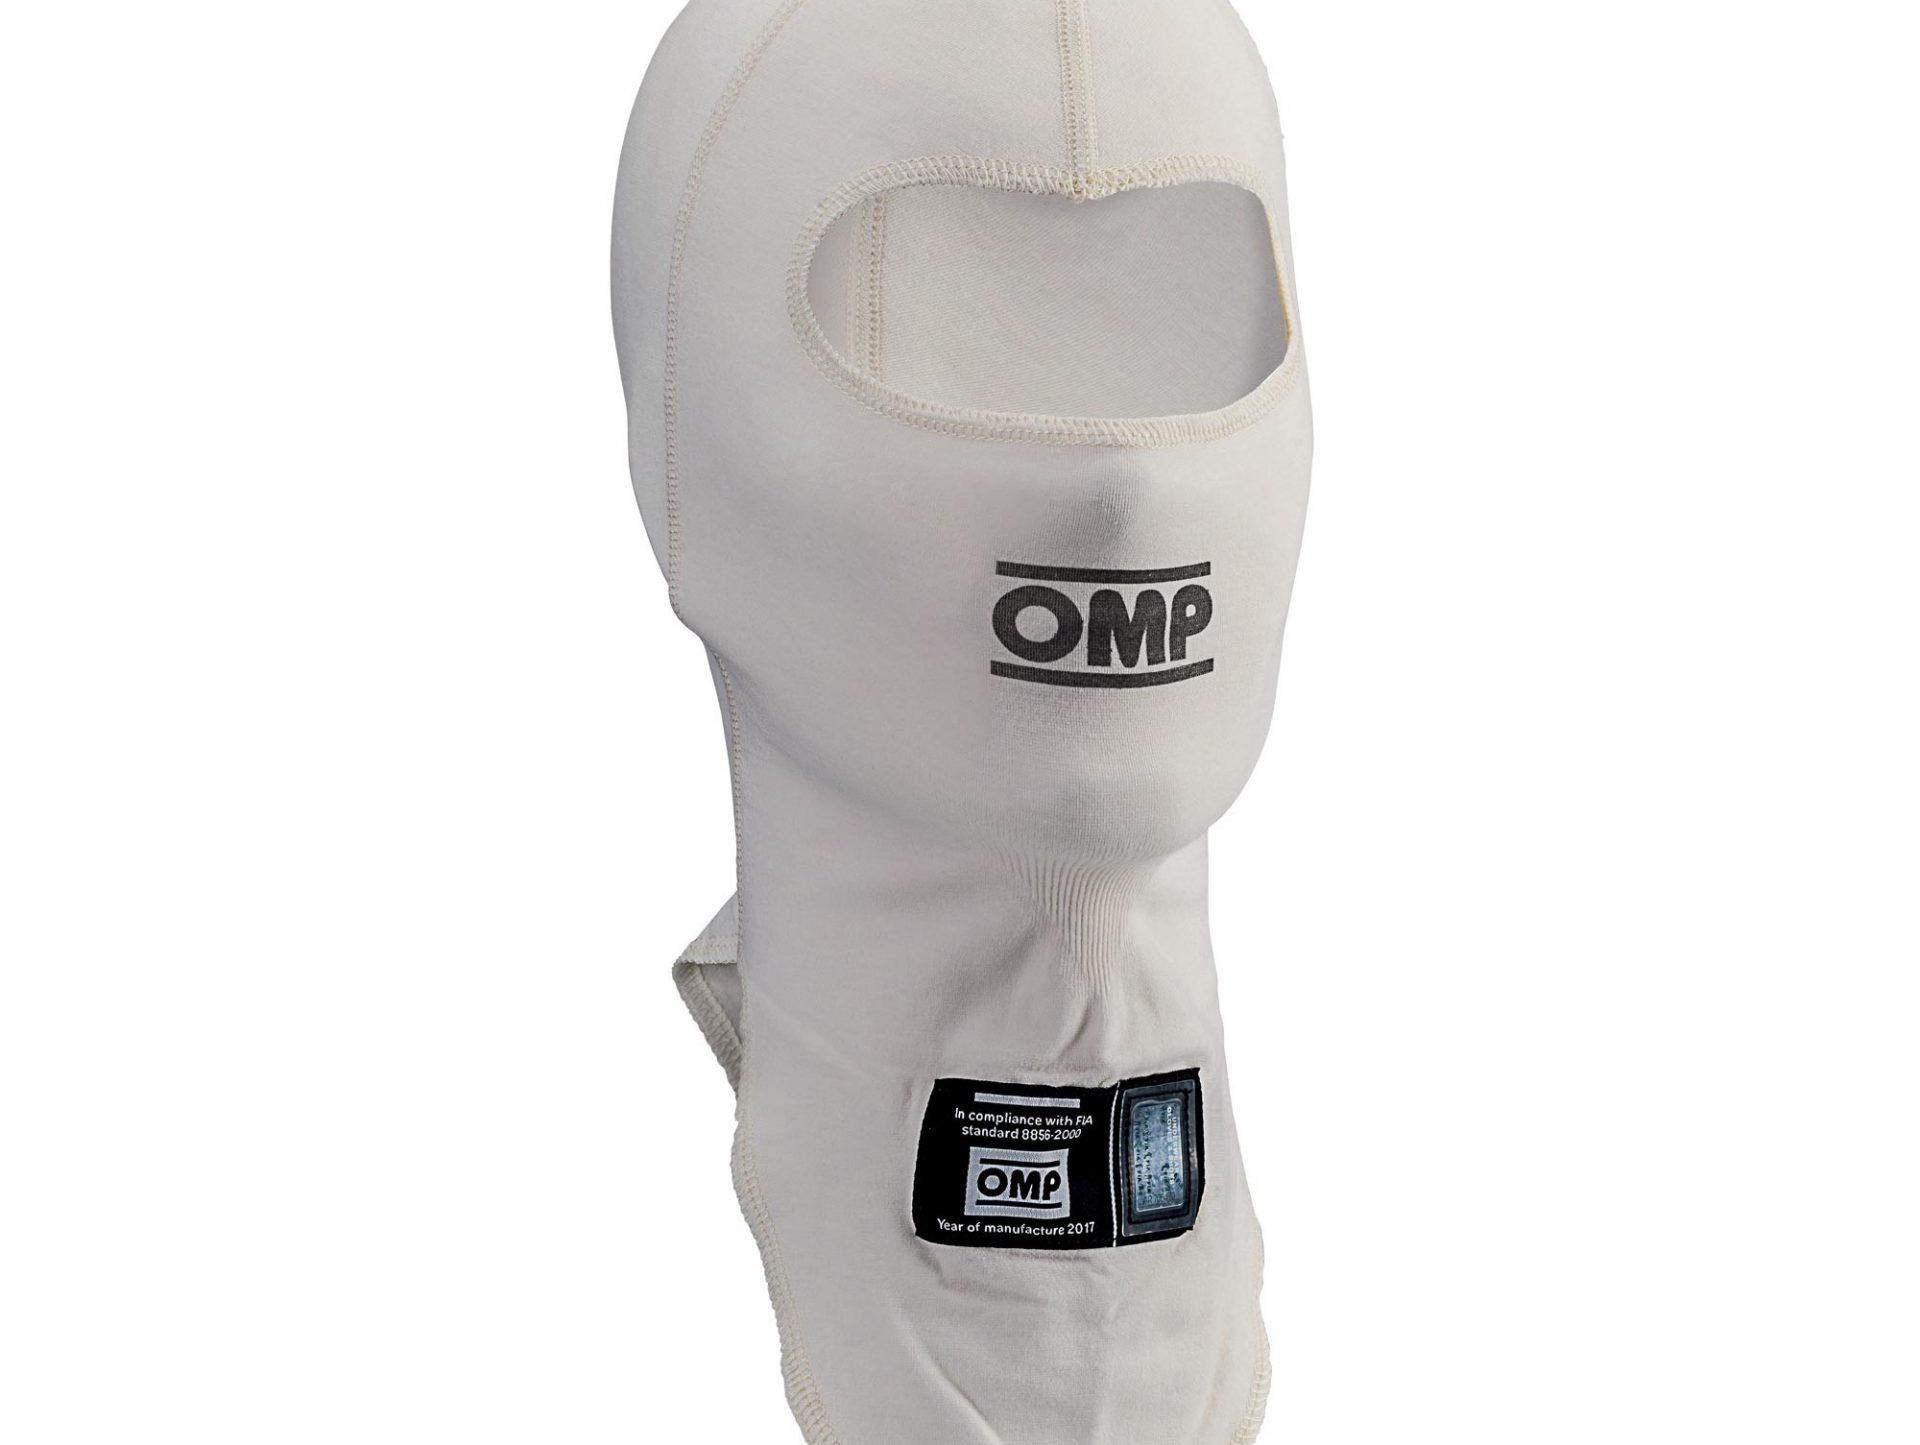 Нов продукт: OMP Tecnica, FIA, Balaclava